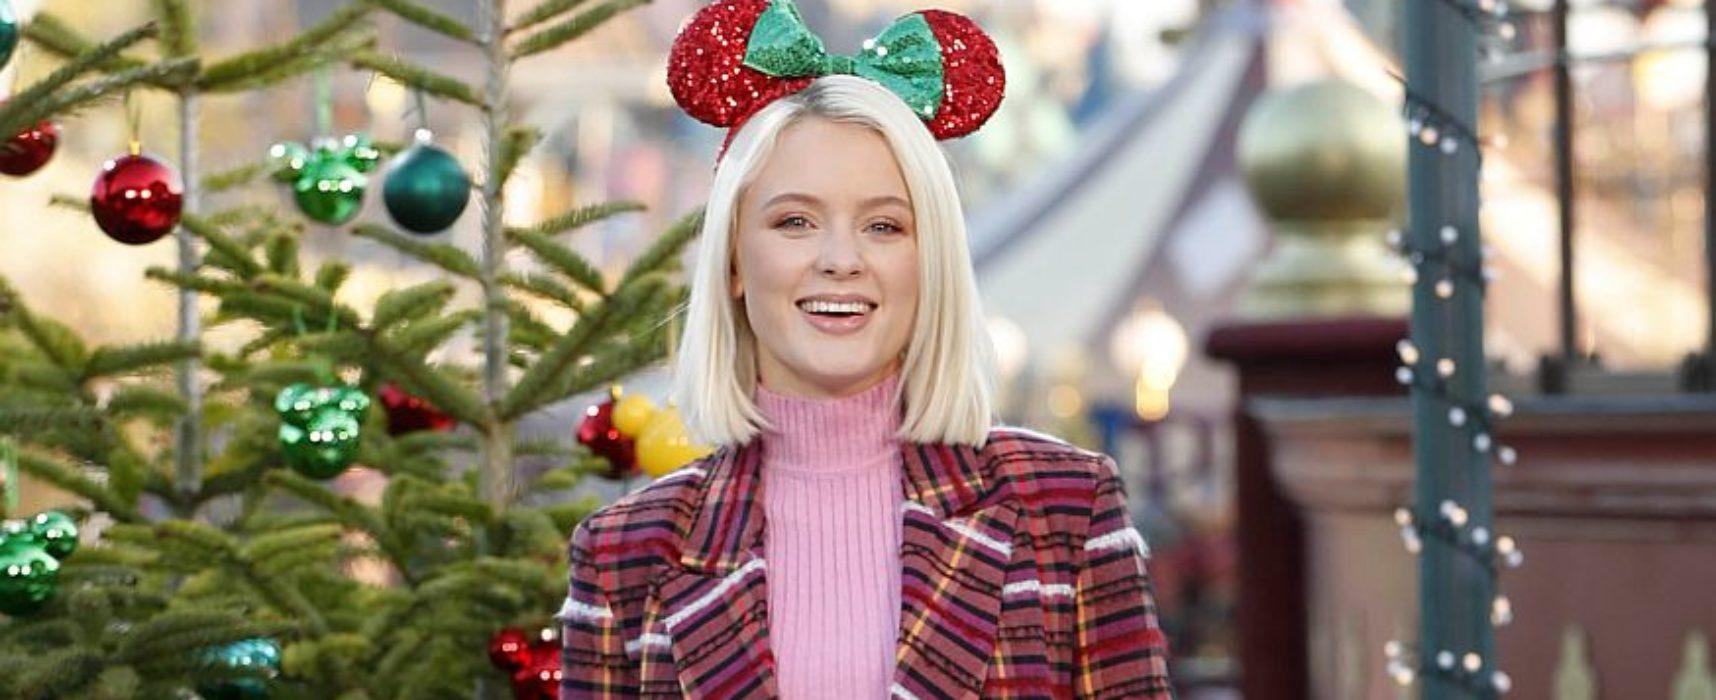 Stars enjoy festive fun at launch of Disneyland Paris' Enchanted Christmas Season